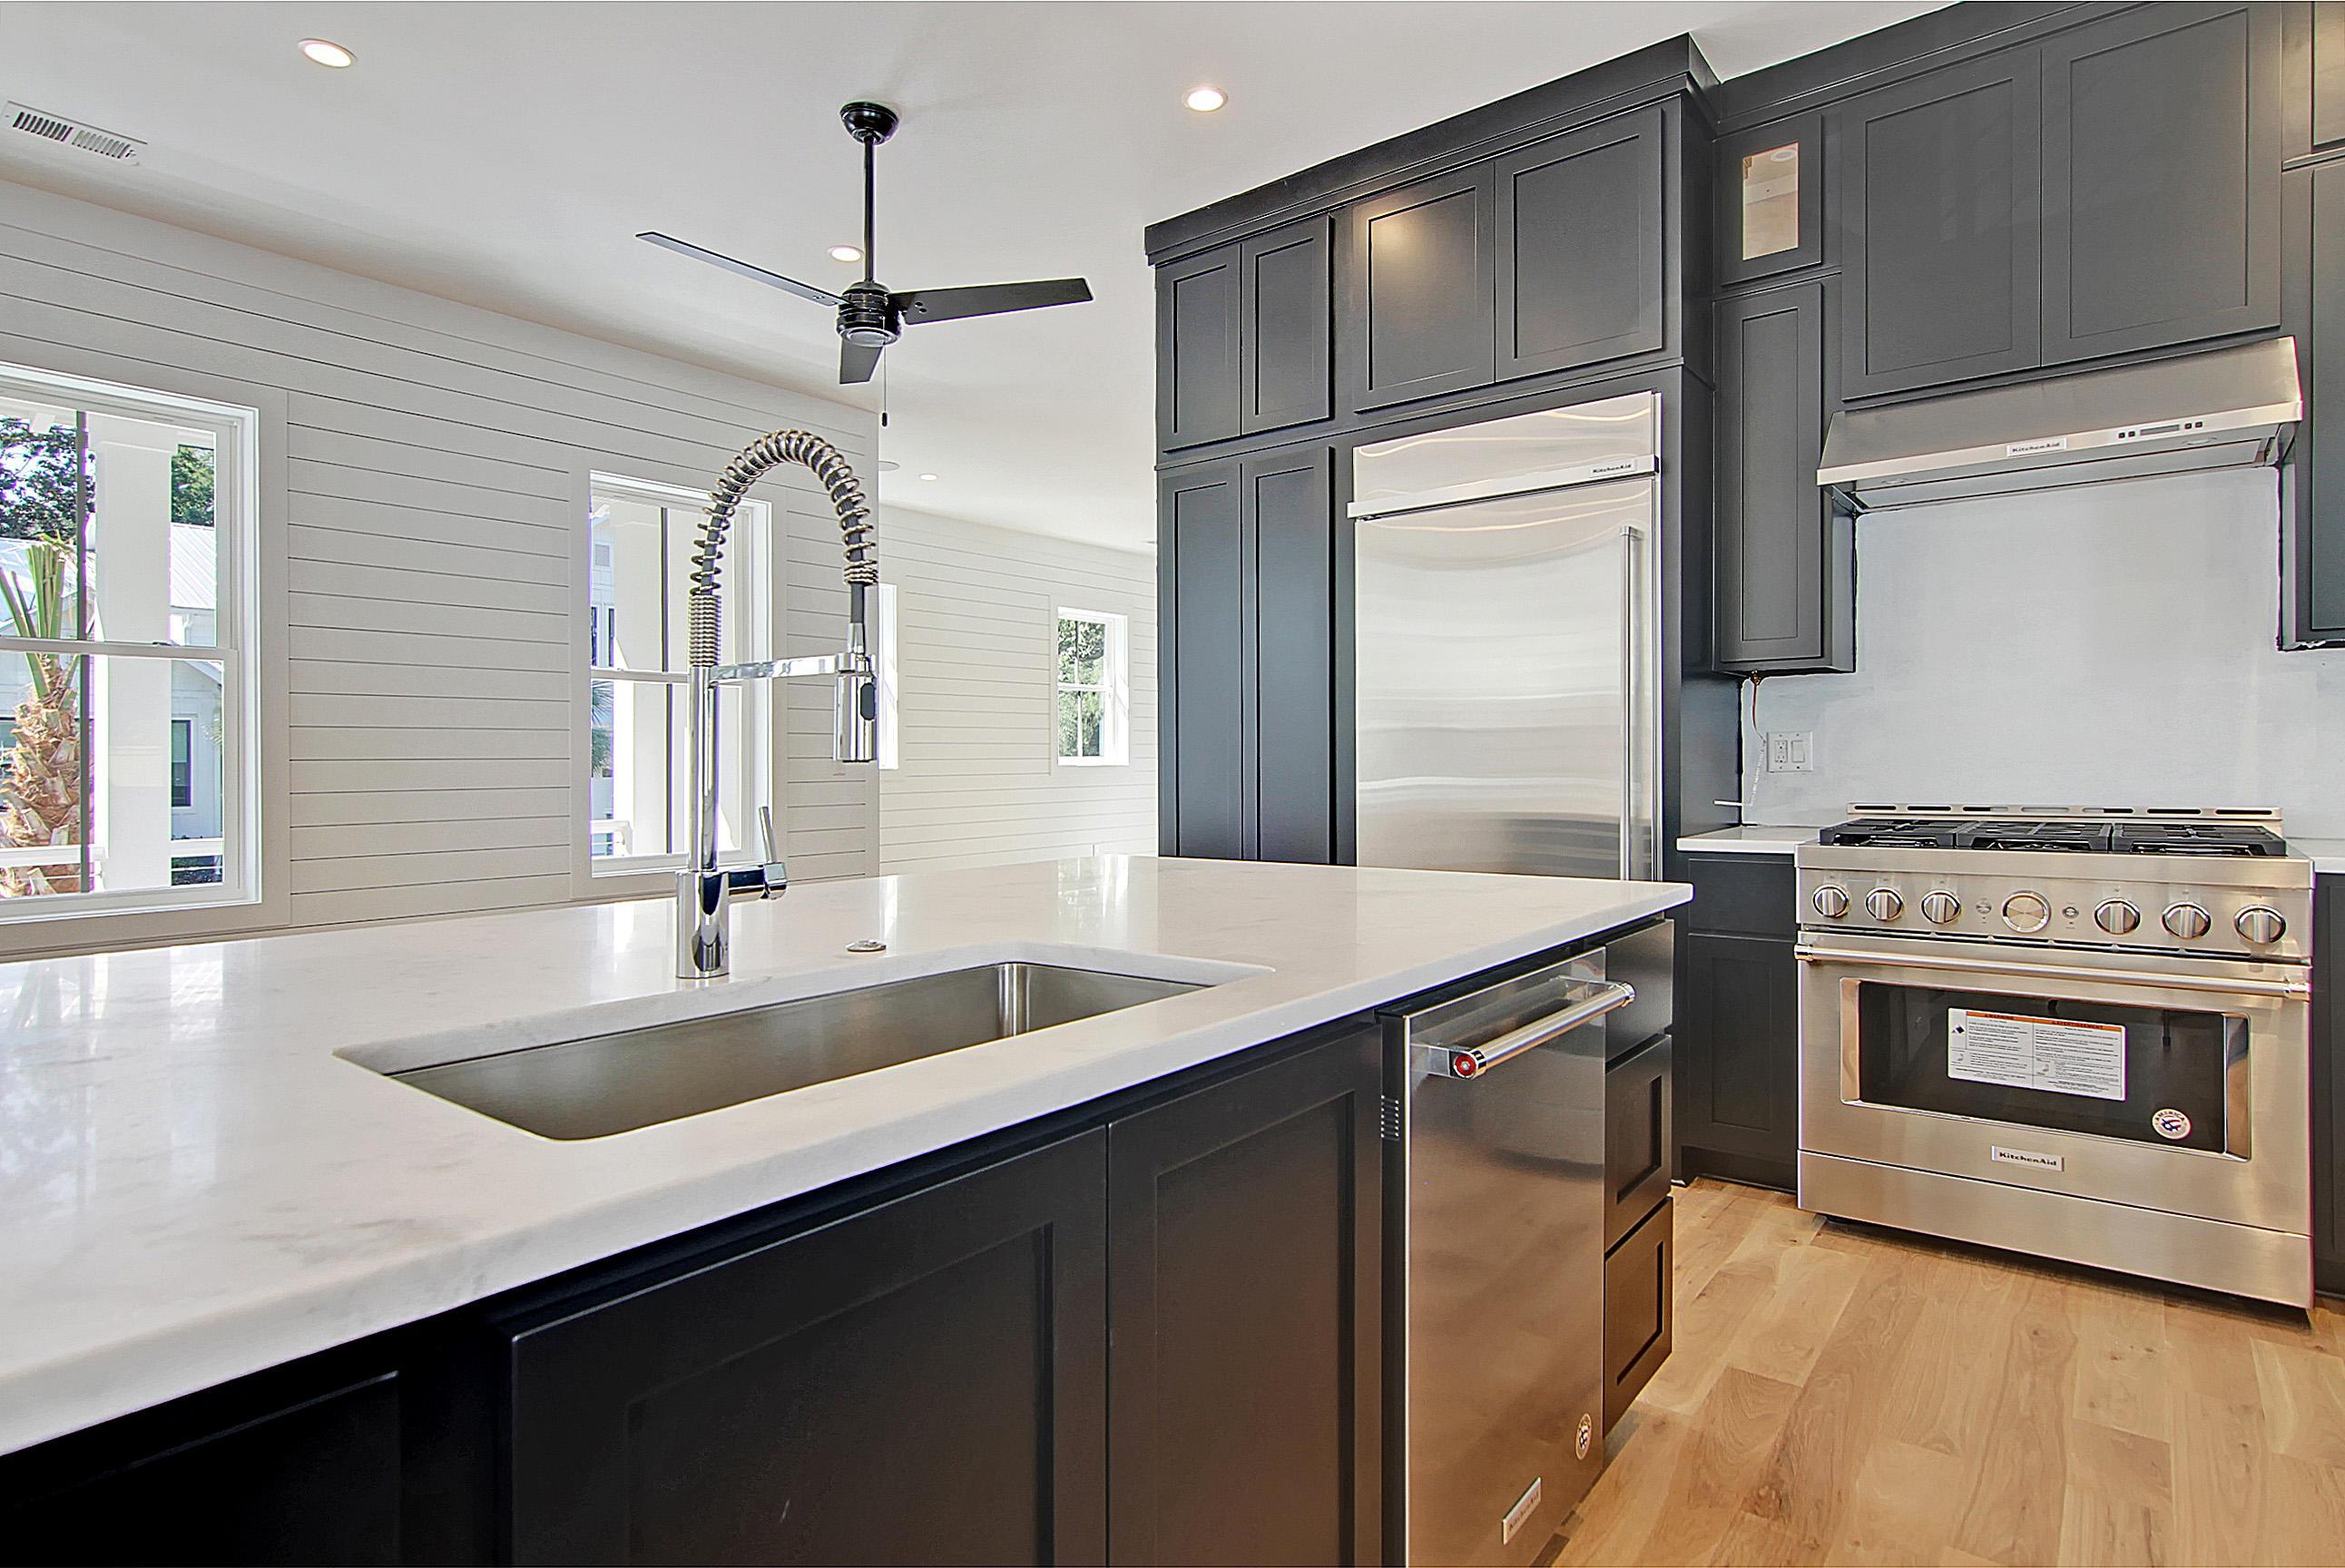 Old Mt Pleasant Homes For Sale - 733 Atlantic, Mount Pleasant, SC - 47